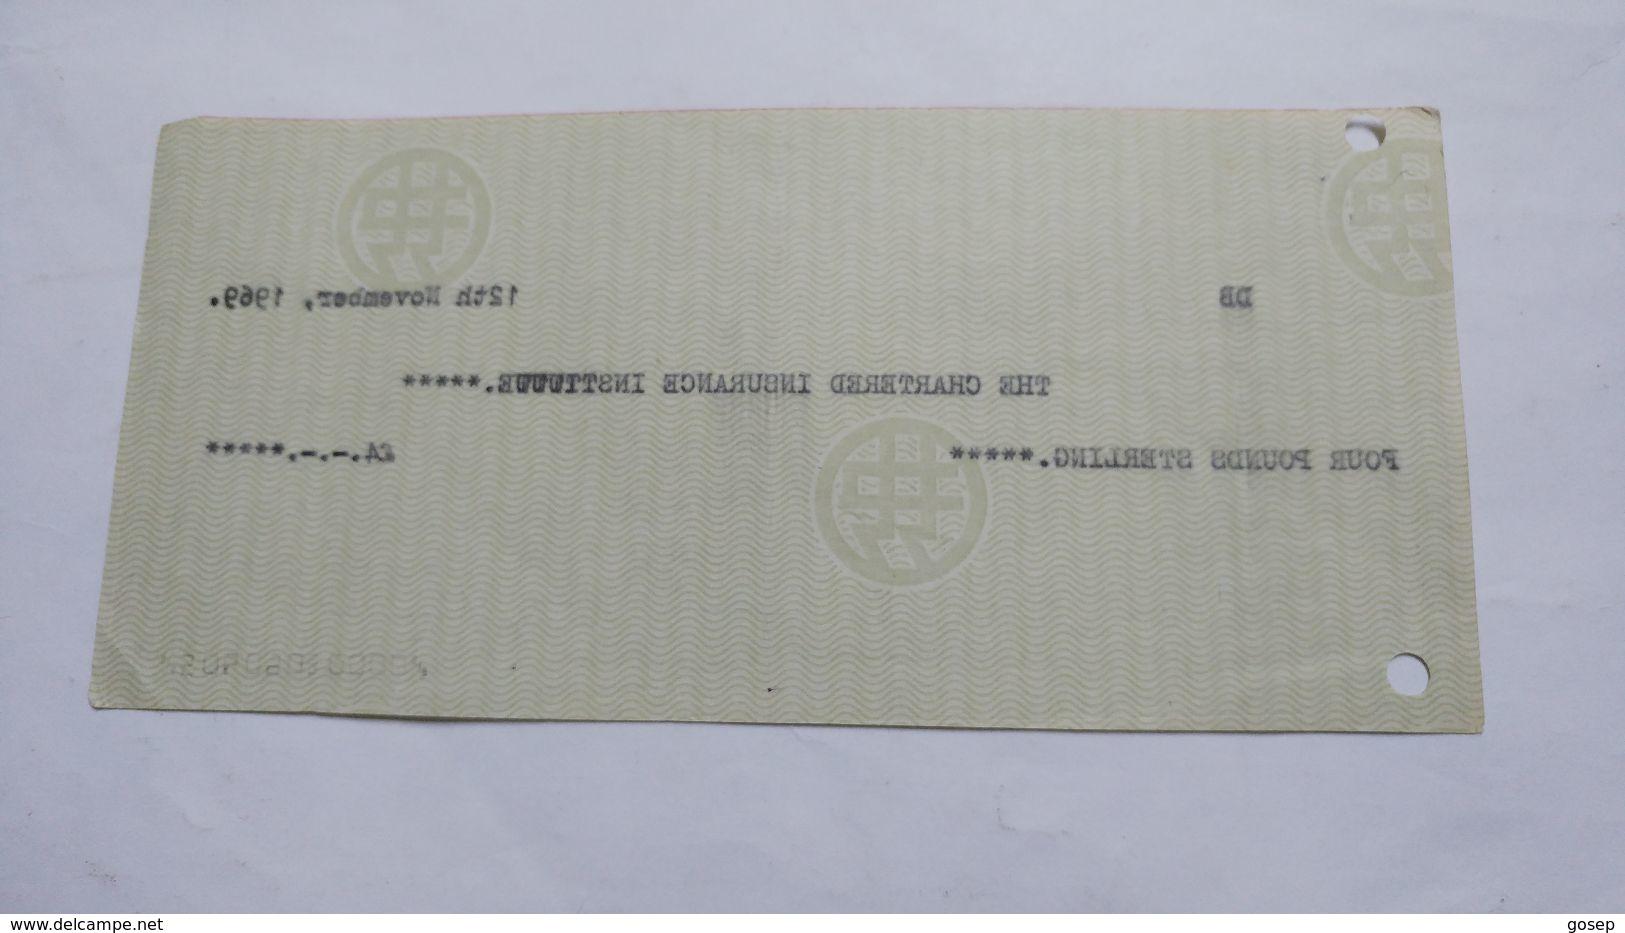 Israel-bank Leumi Le Israrl Limited-(12.11.1969)-(number Cheek-18531) - Israel